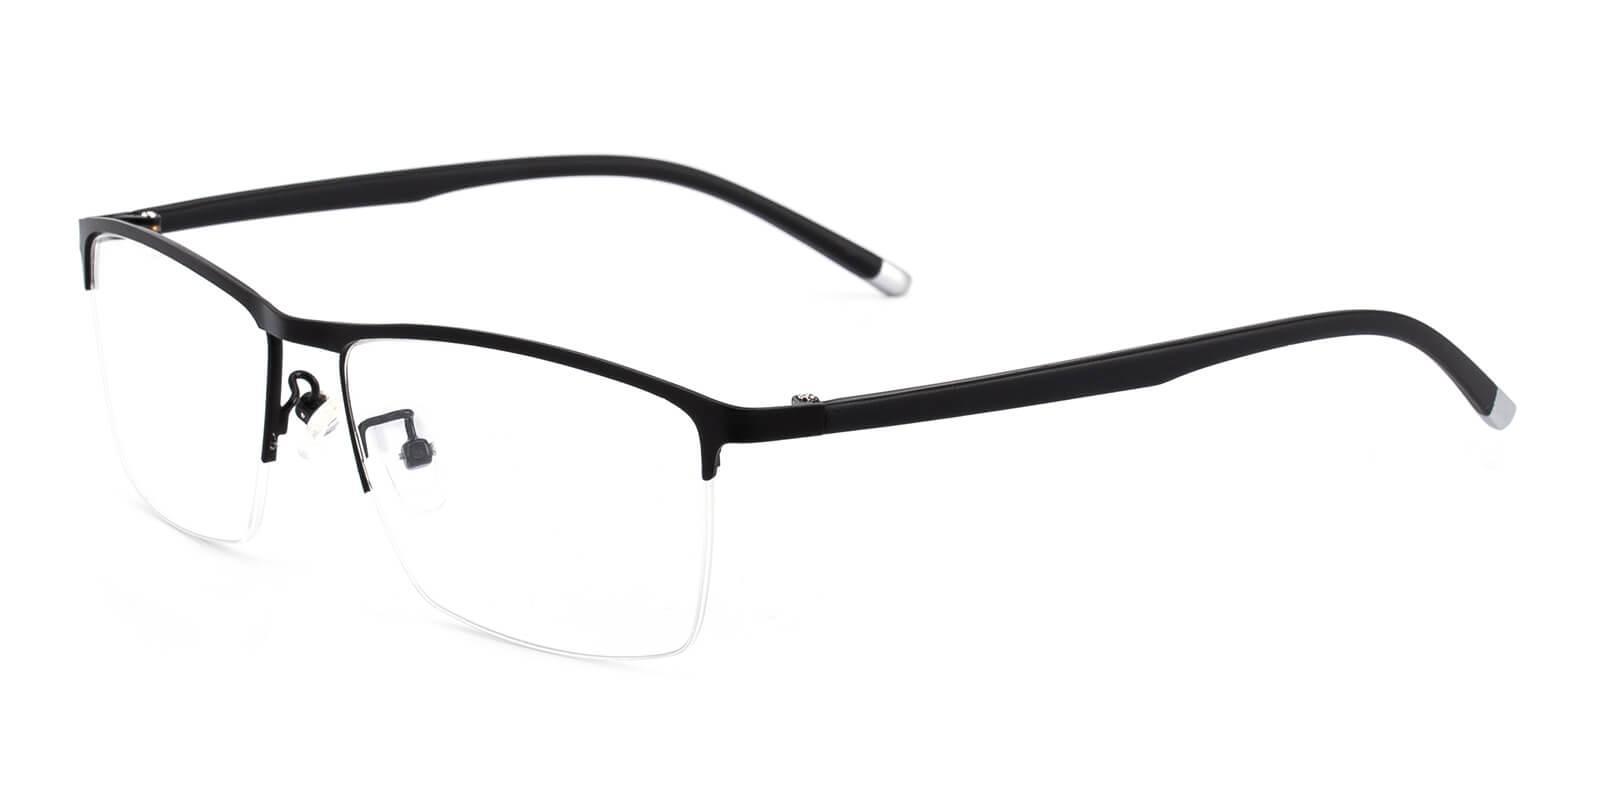 Simon-Black-Rectangle-Metal-Eyeglasses-additional1